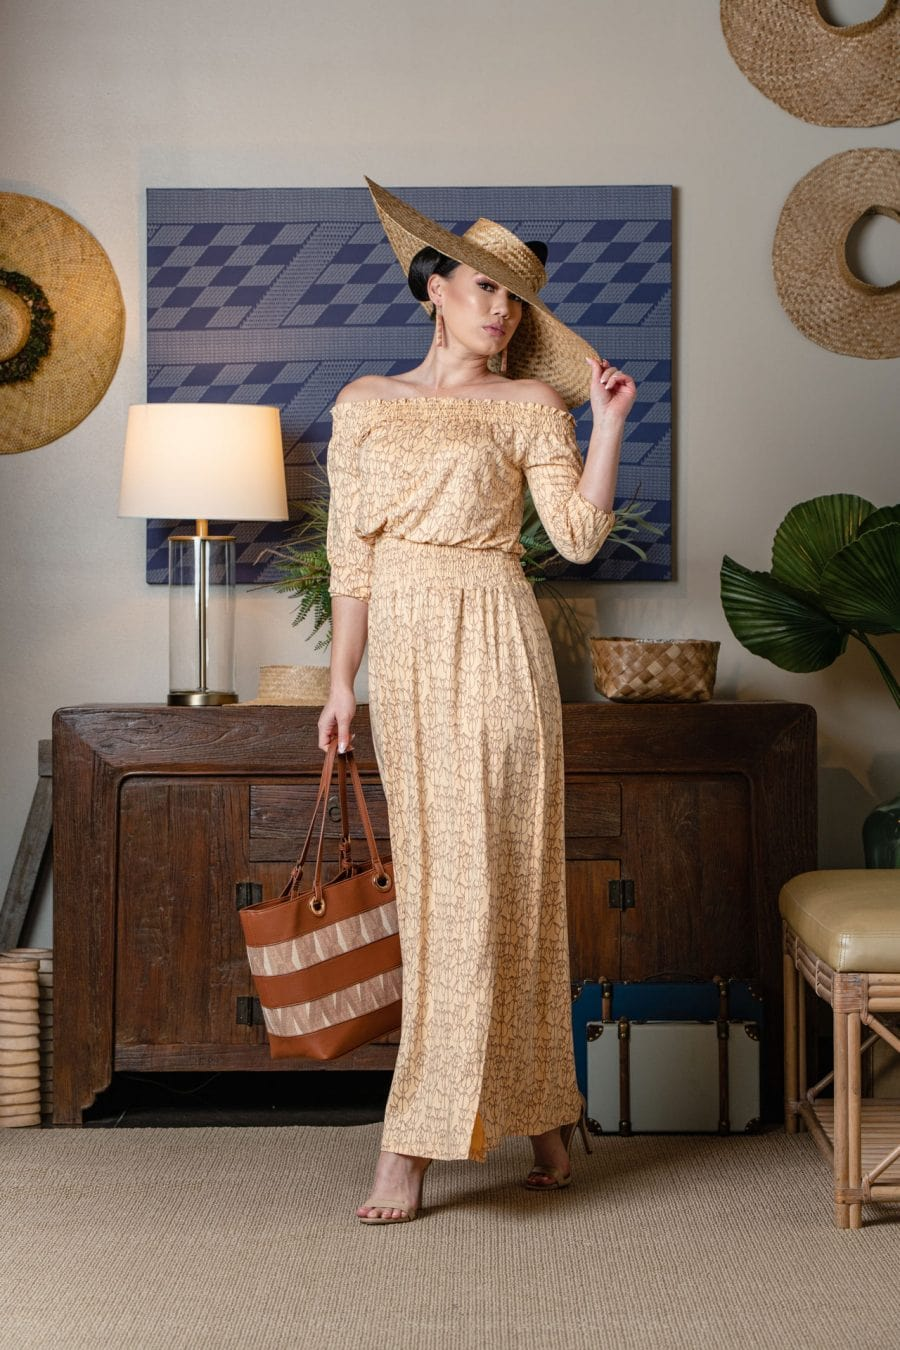 Model wearing NAHELE MAXI in Apricot Sherbert/Gingersnap Kapualiko - Front View